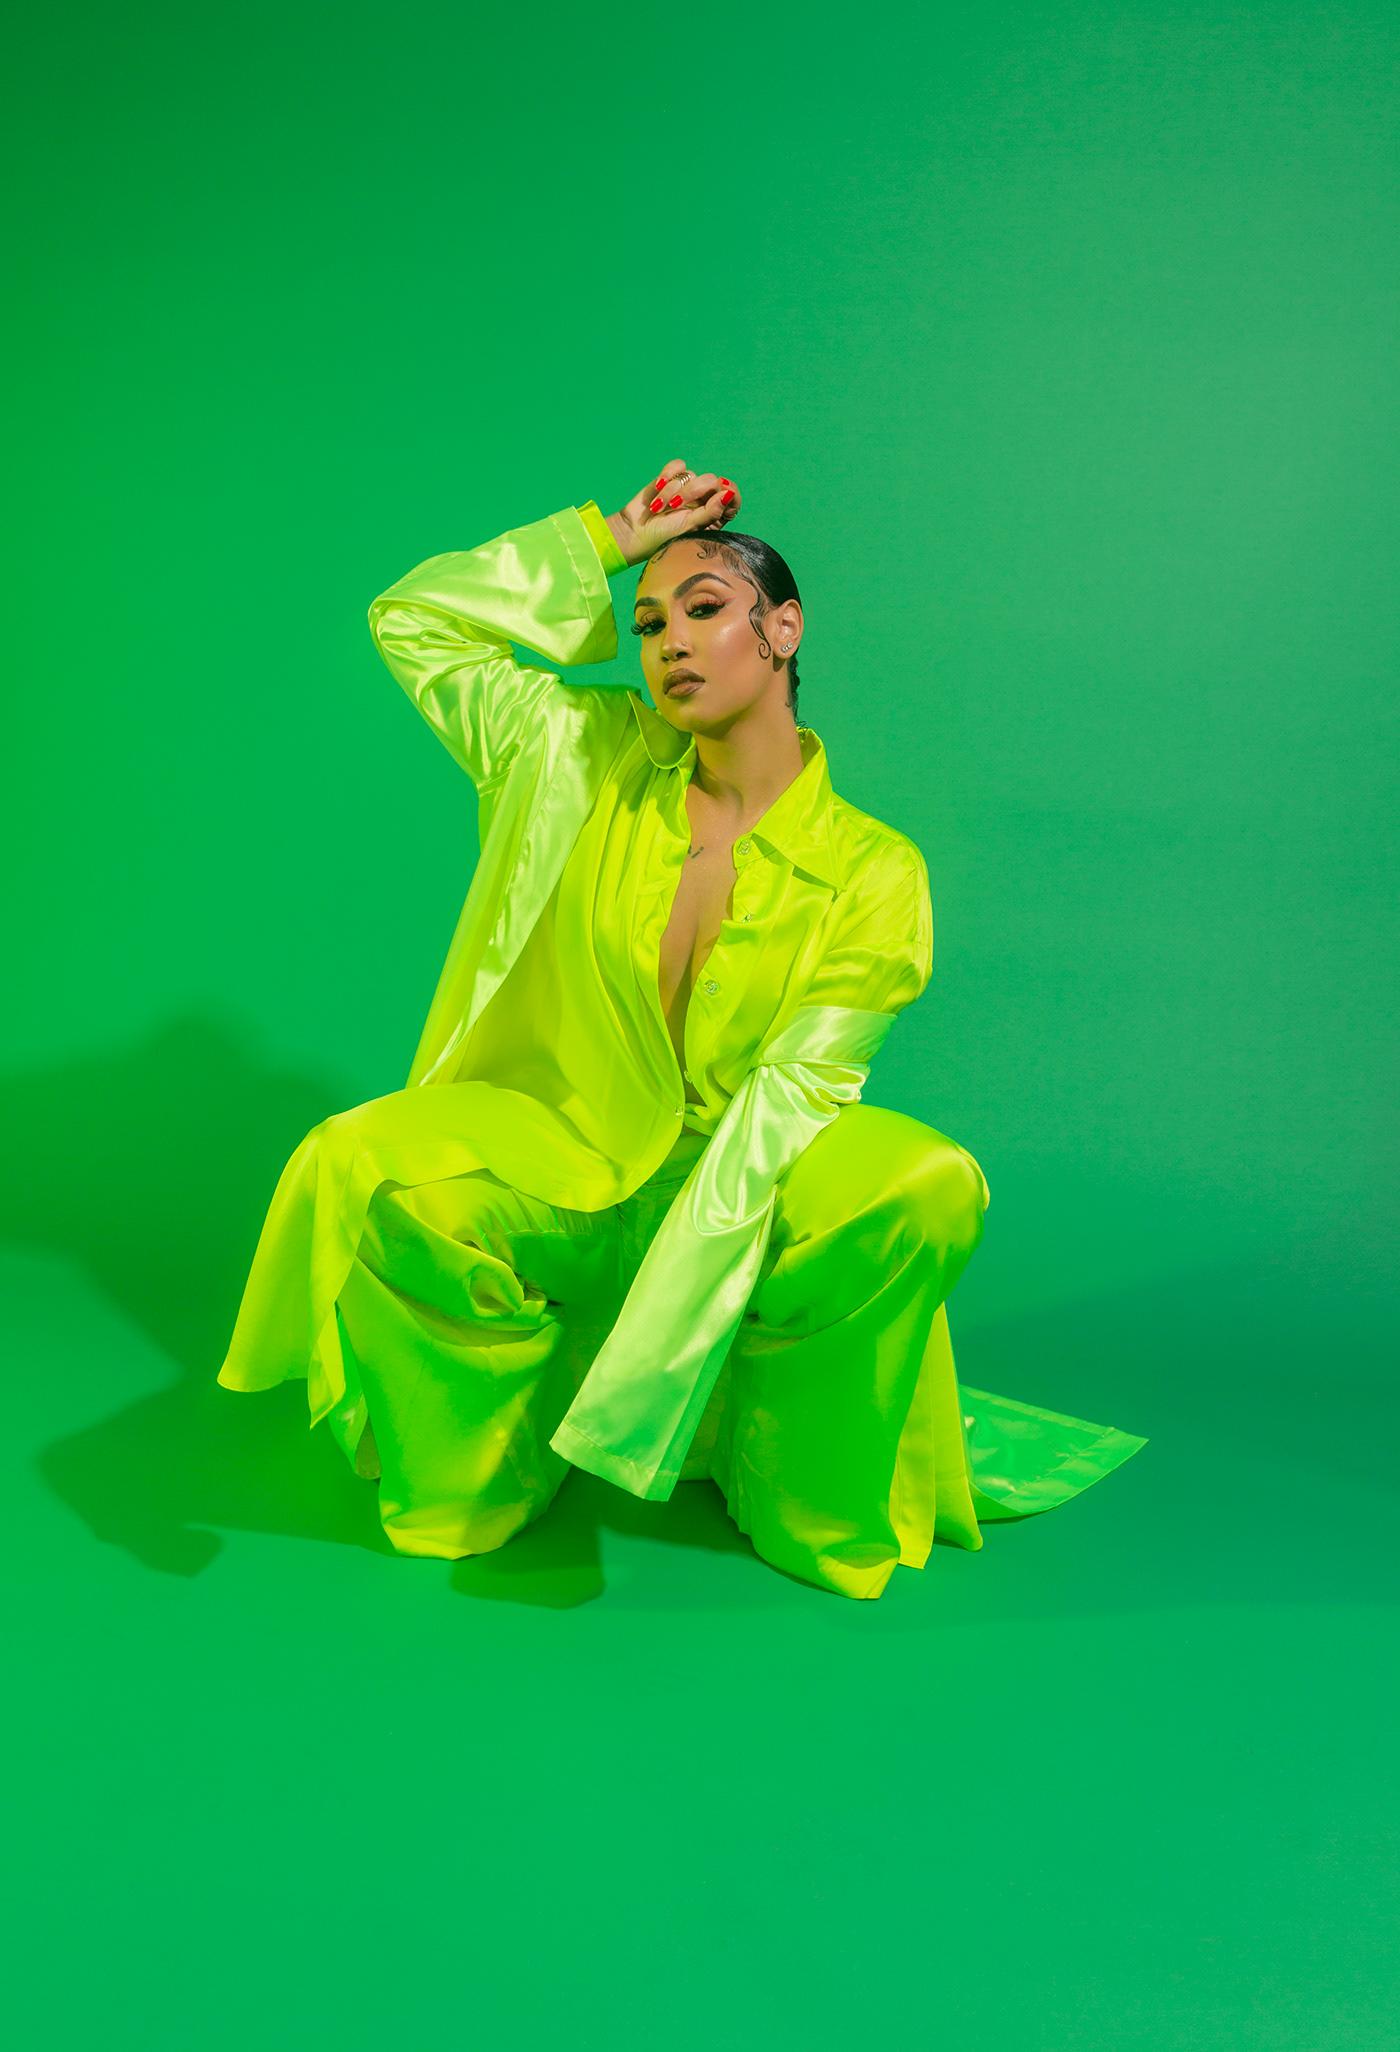 album cover artist capitol records Celebrity creative female photographer queen naija RNB